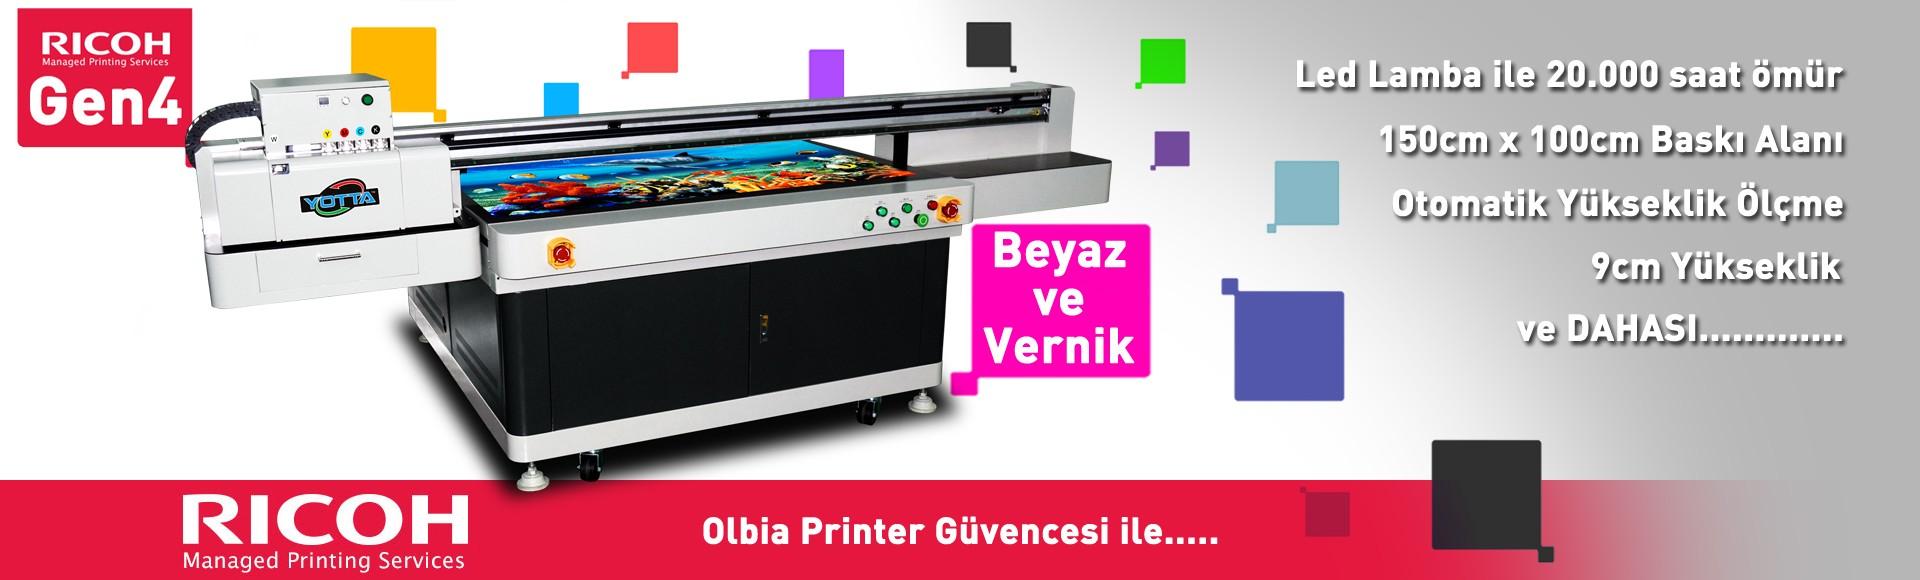 Olbia Printer